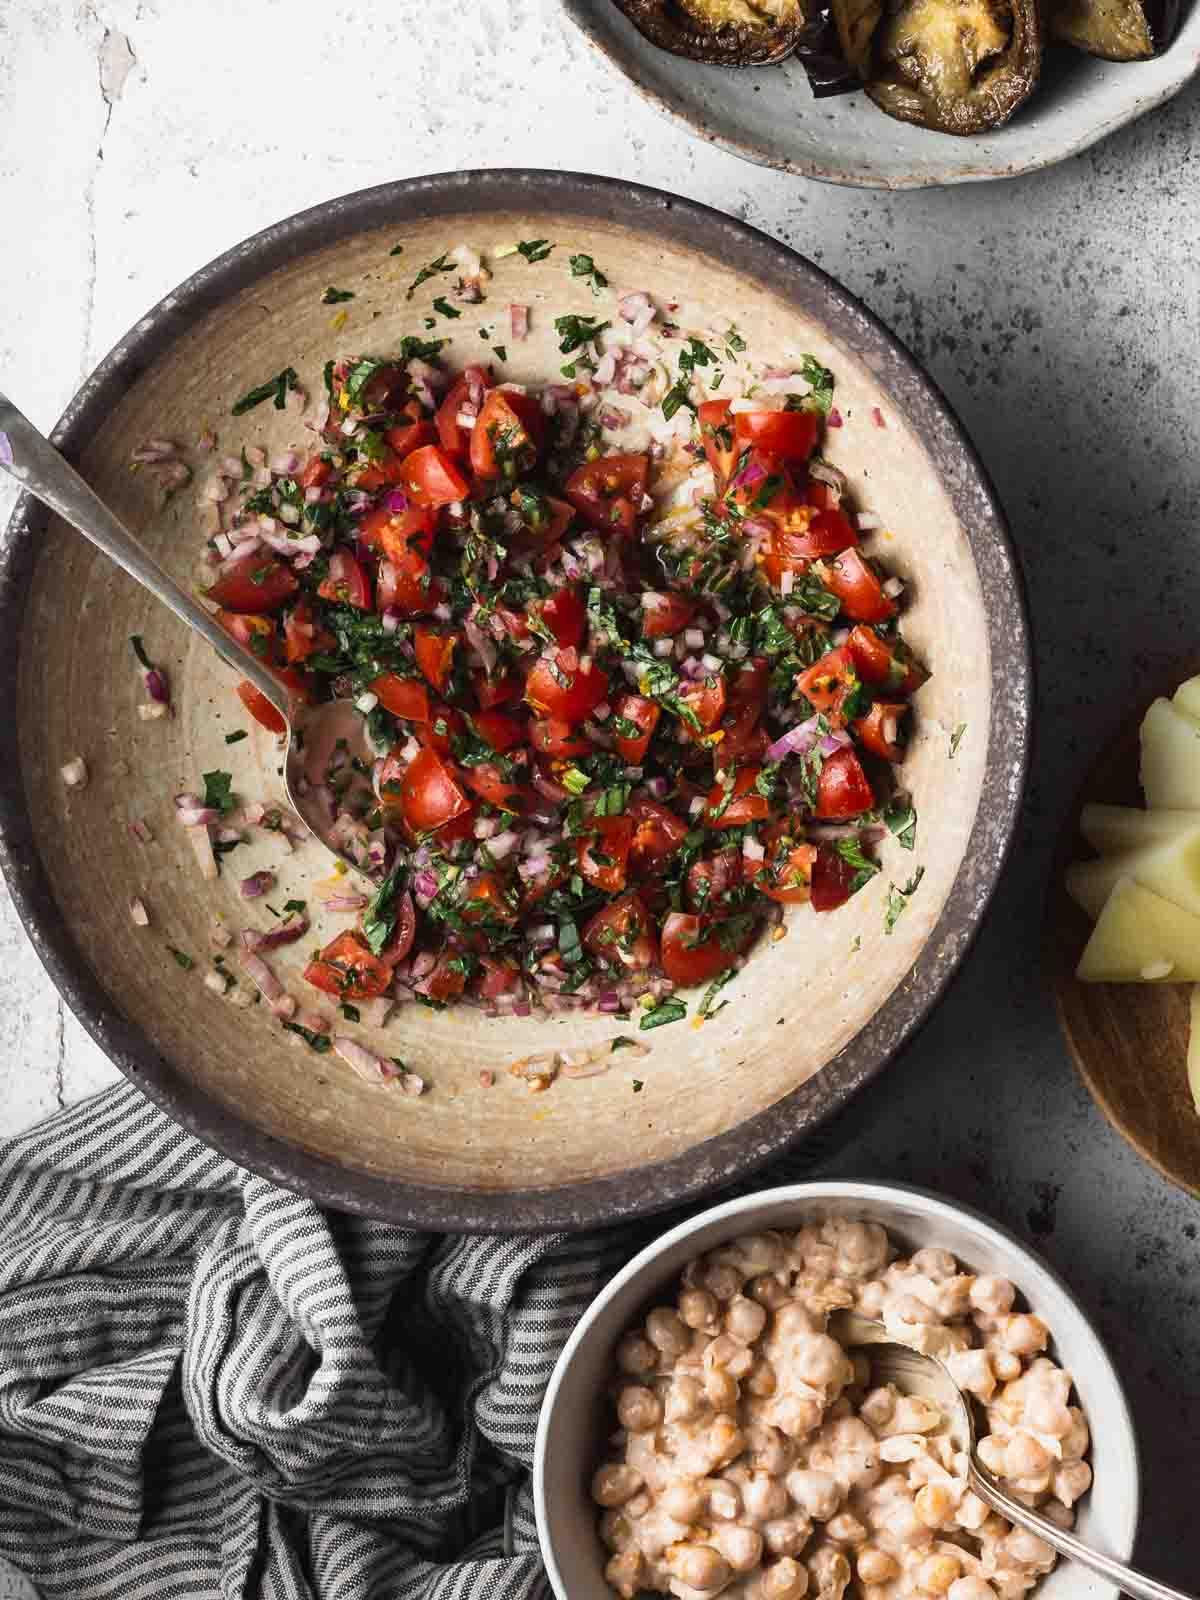 A bowl of chopped tomato salad.